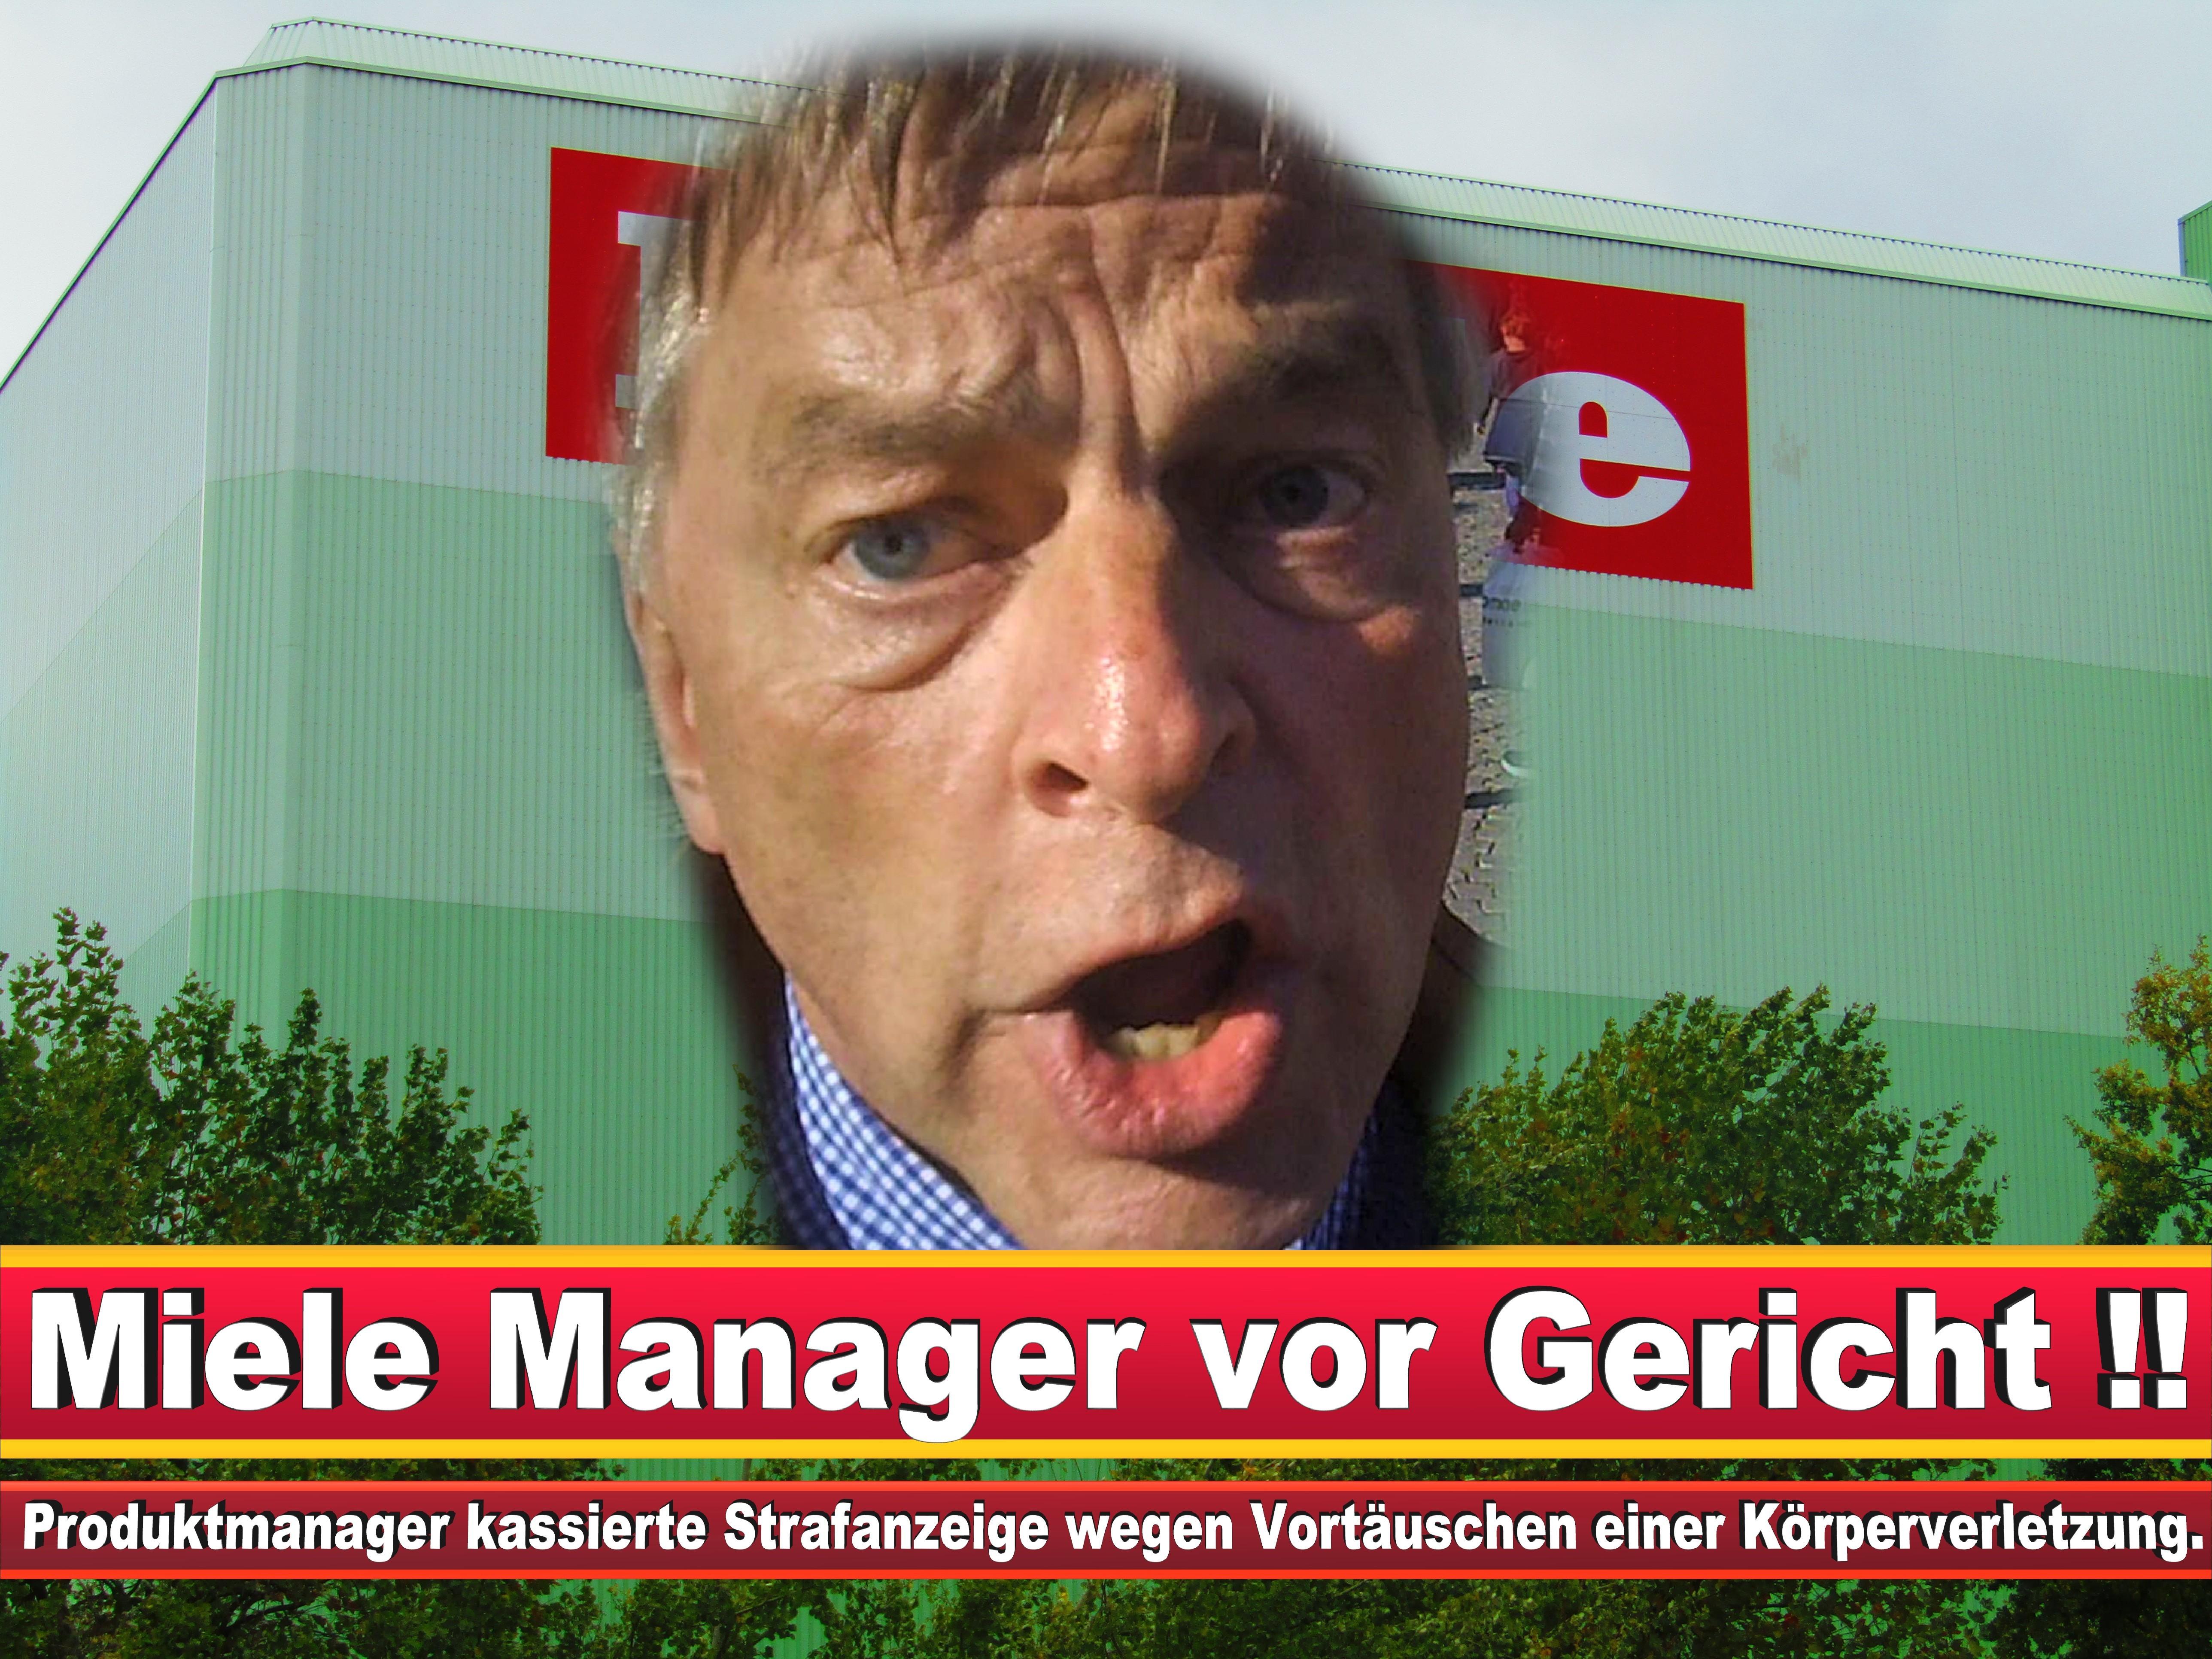 MIELE BIELEFELD FACHKRAFT FÜR LAGERLOGISTIK